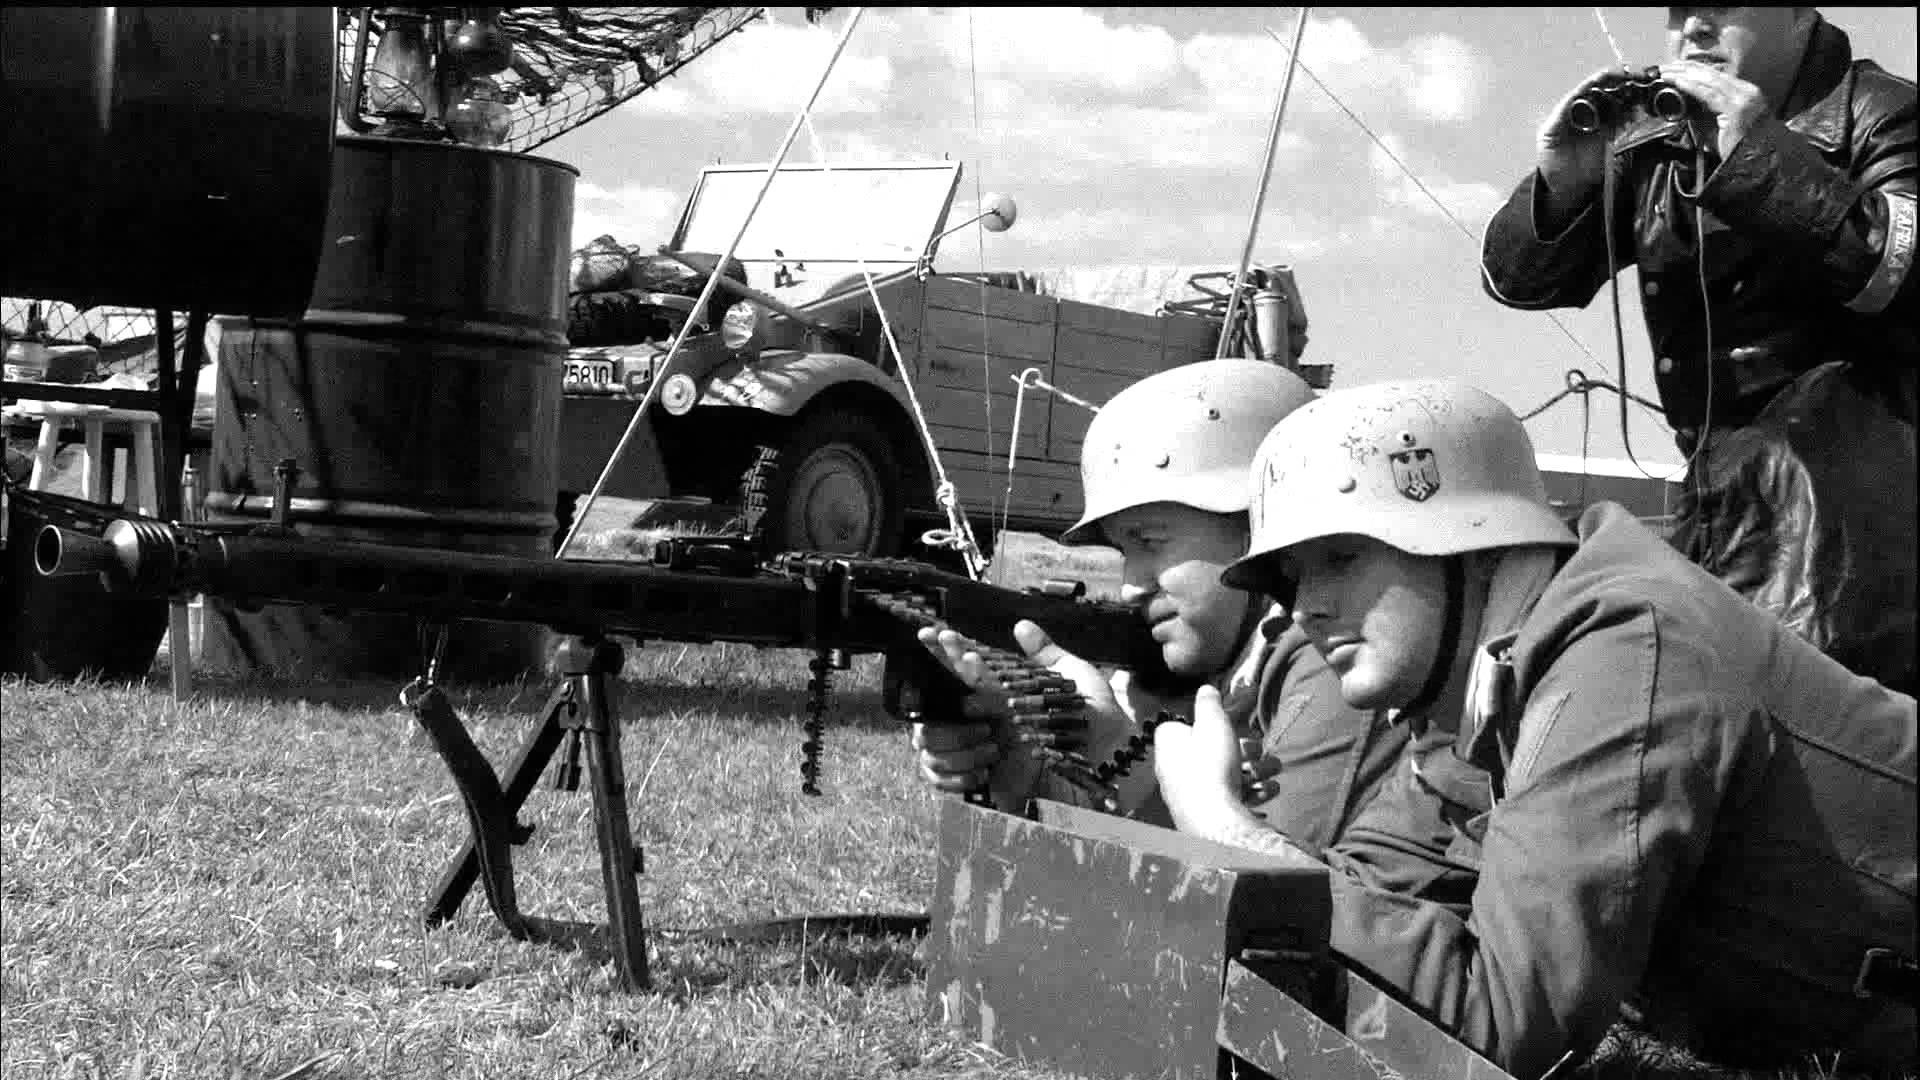 Mg42 machine gun weapon military germany ww2 wwll 17 wallpaper mg42 machine gun weapon military germany ww2 wwll 17 wallpaper 1920x1080 365083 wallpaperup altavistaventures Image collections